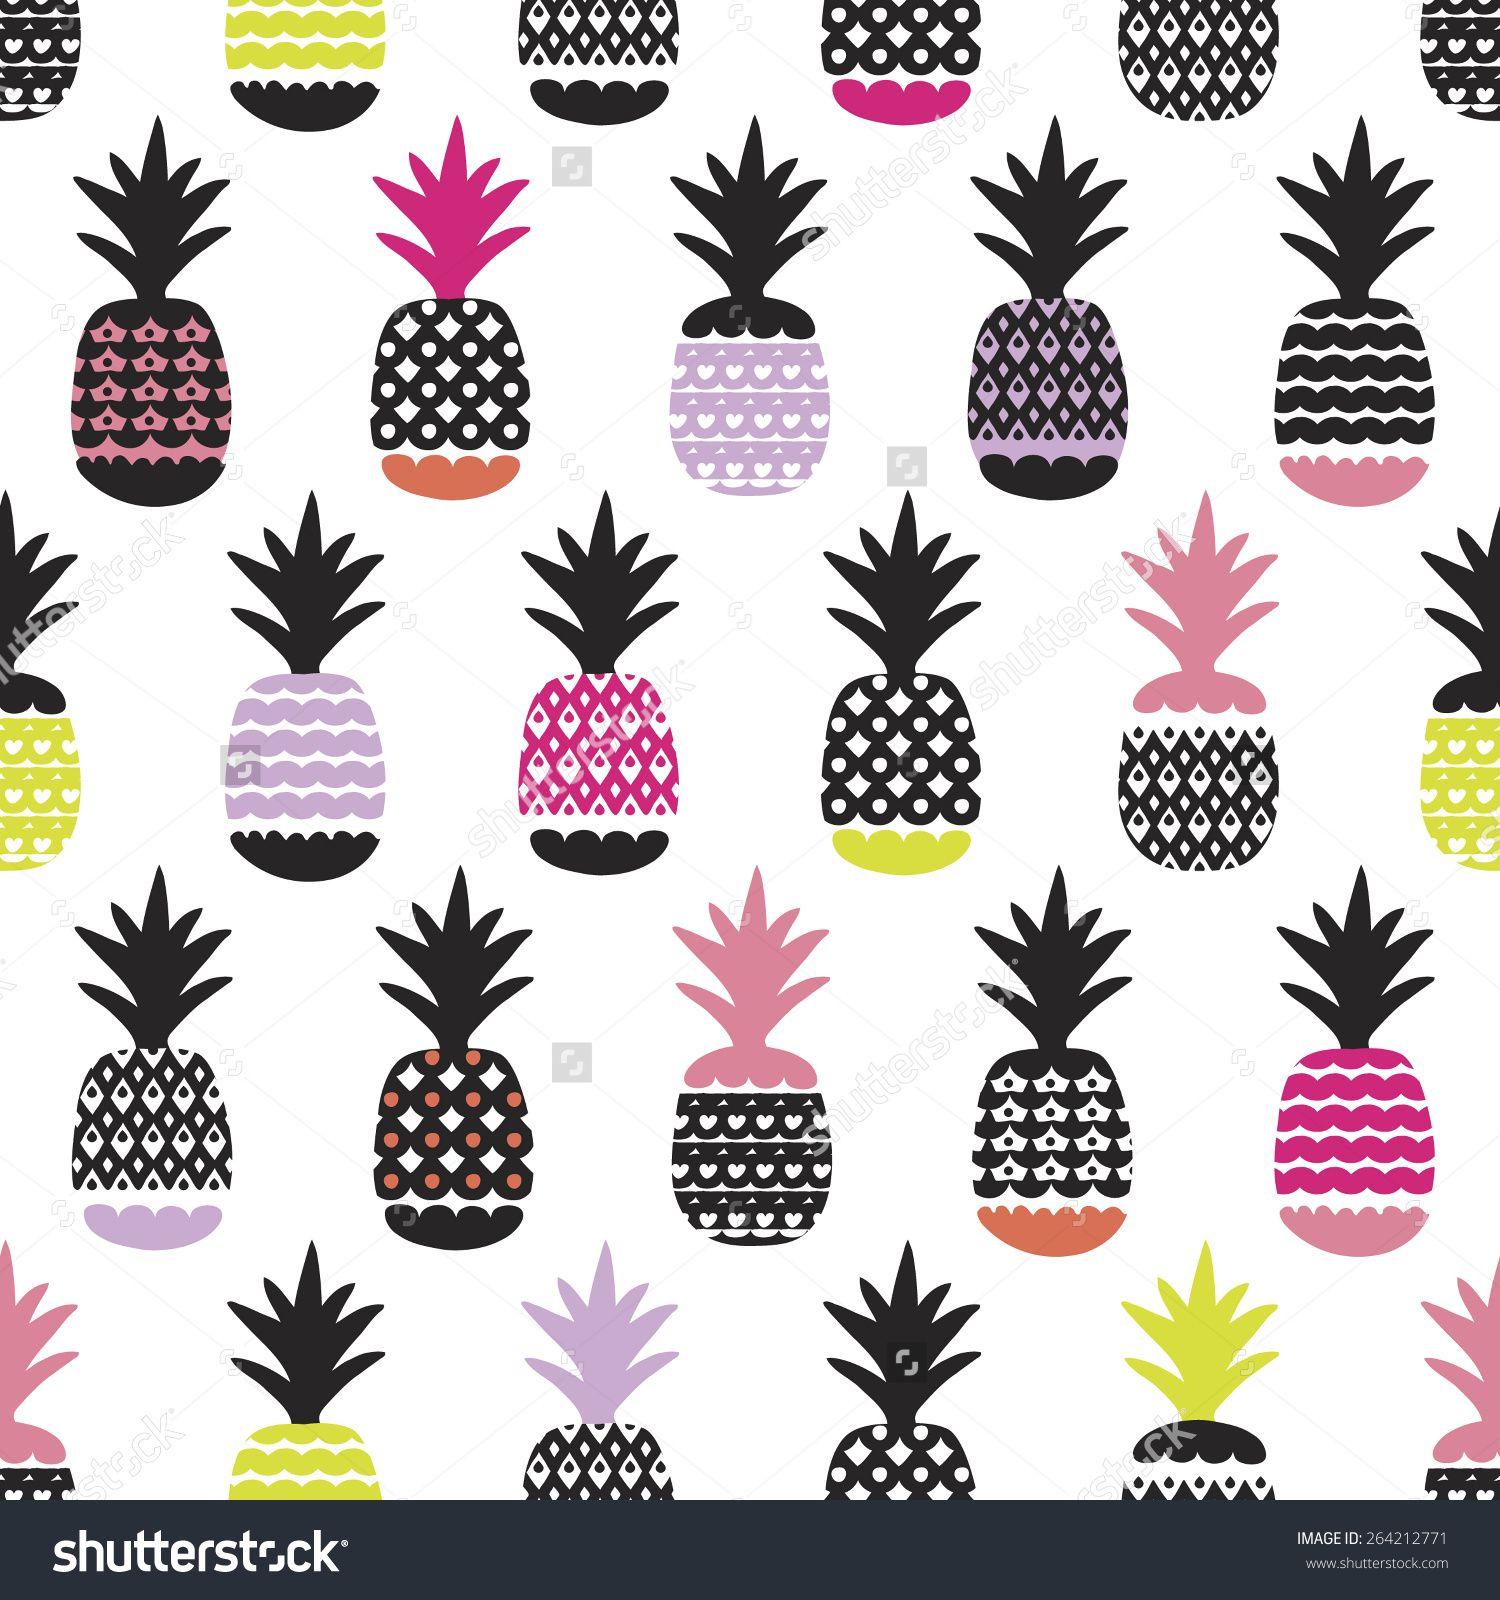 f556418aed Seamless pineapple retro summer bikini beach theme fruit hot trendy  illustration background pattern in vector